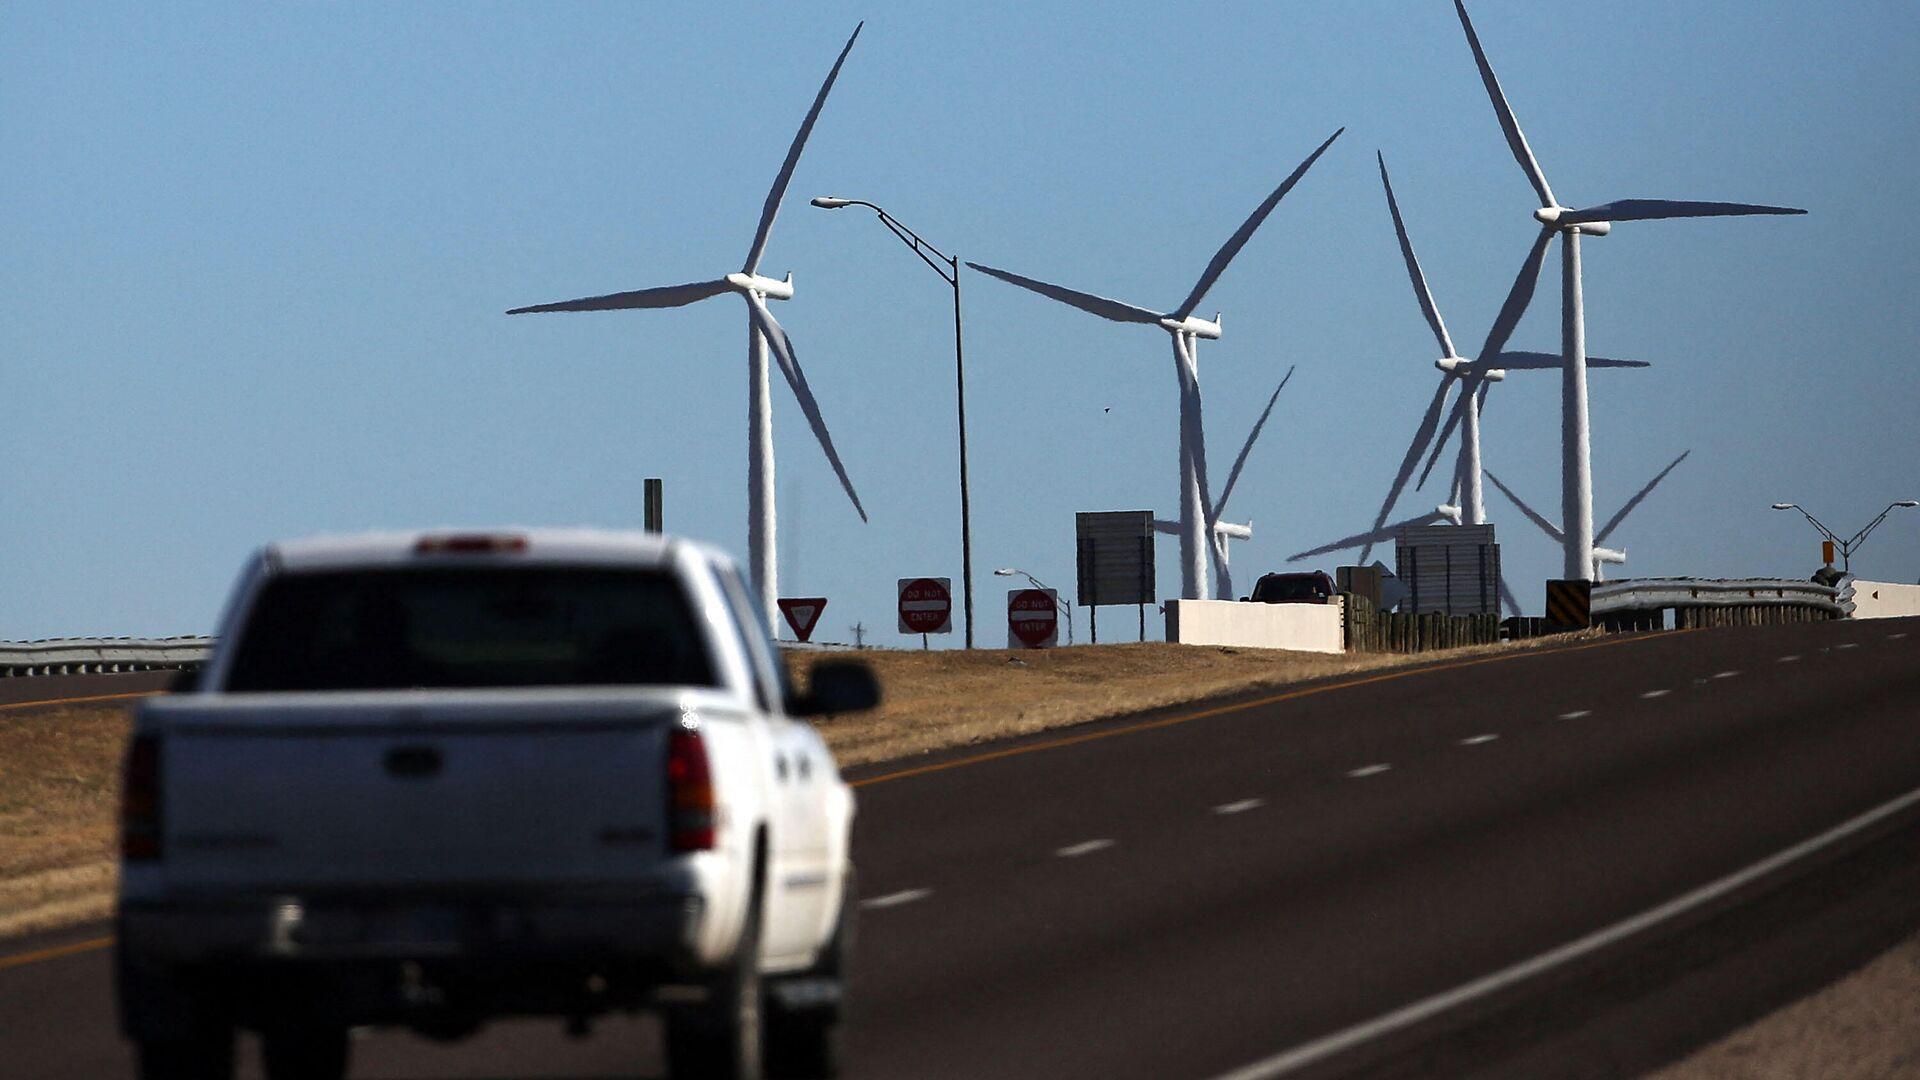 Ветряная электростанция в Колорадо-Сити, США - РИА Новости, 1920, 11.10.2021